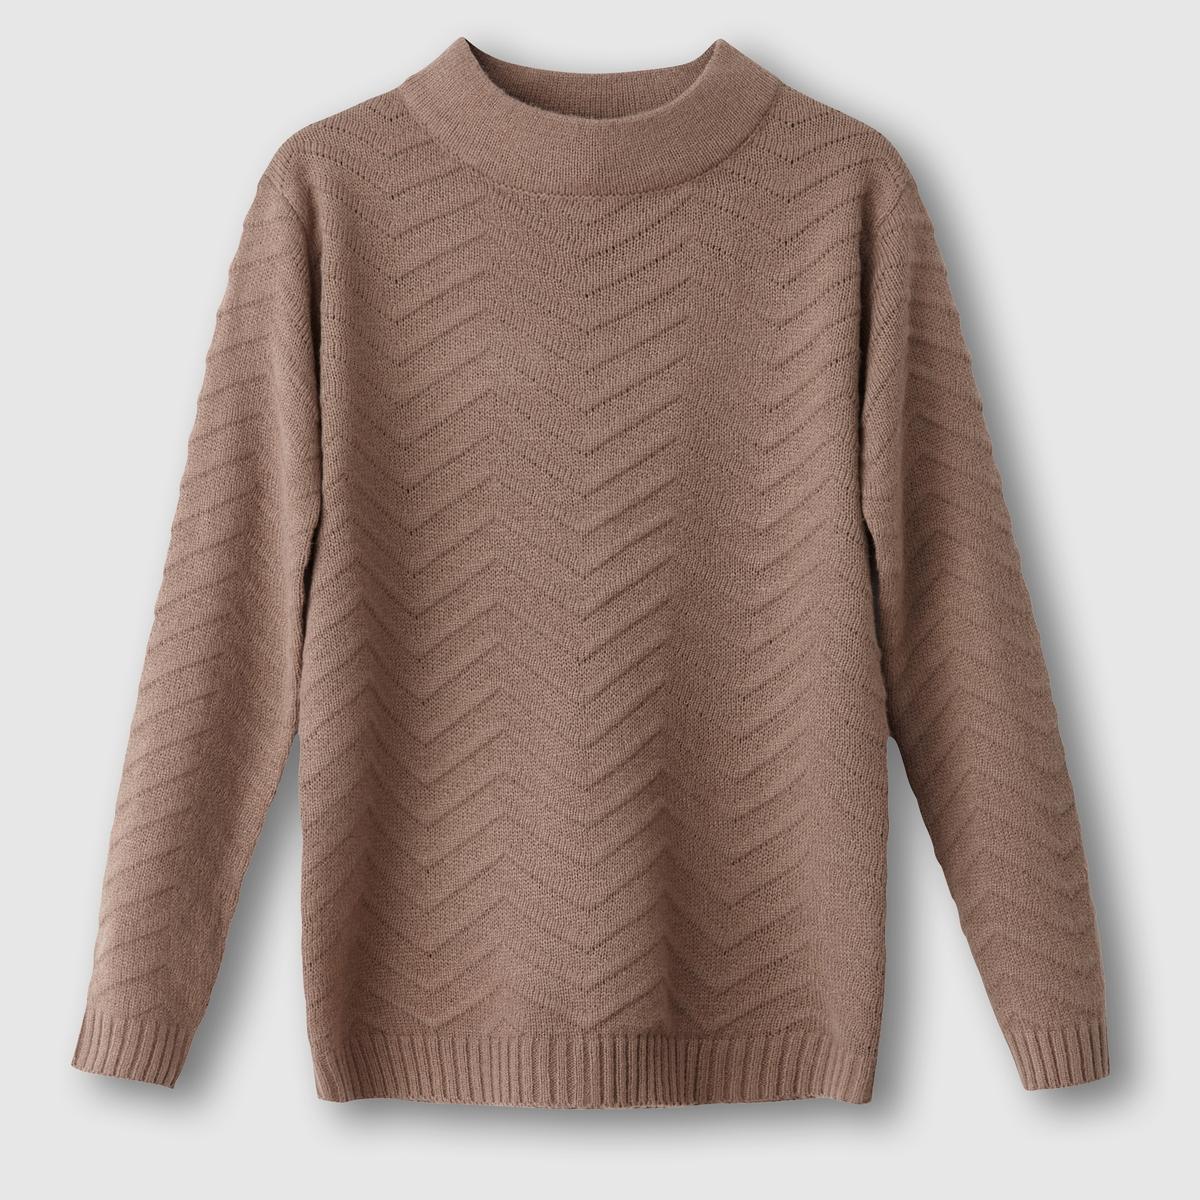 Пуловер MANILLA PULLOVERСостав и описание :Материал : 100% акрилМарка : B.YOUNG<br><br>Цвет: синий морской<br>Размер: S.L